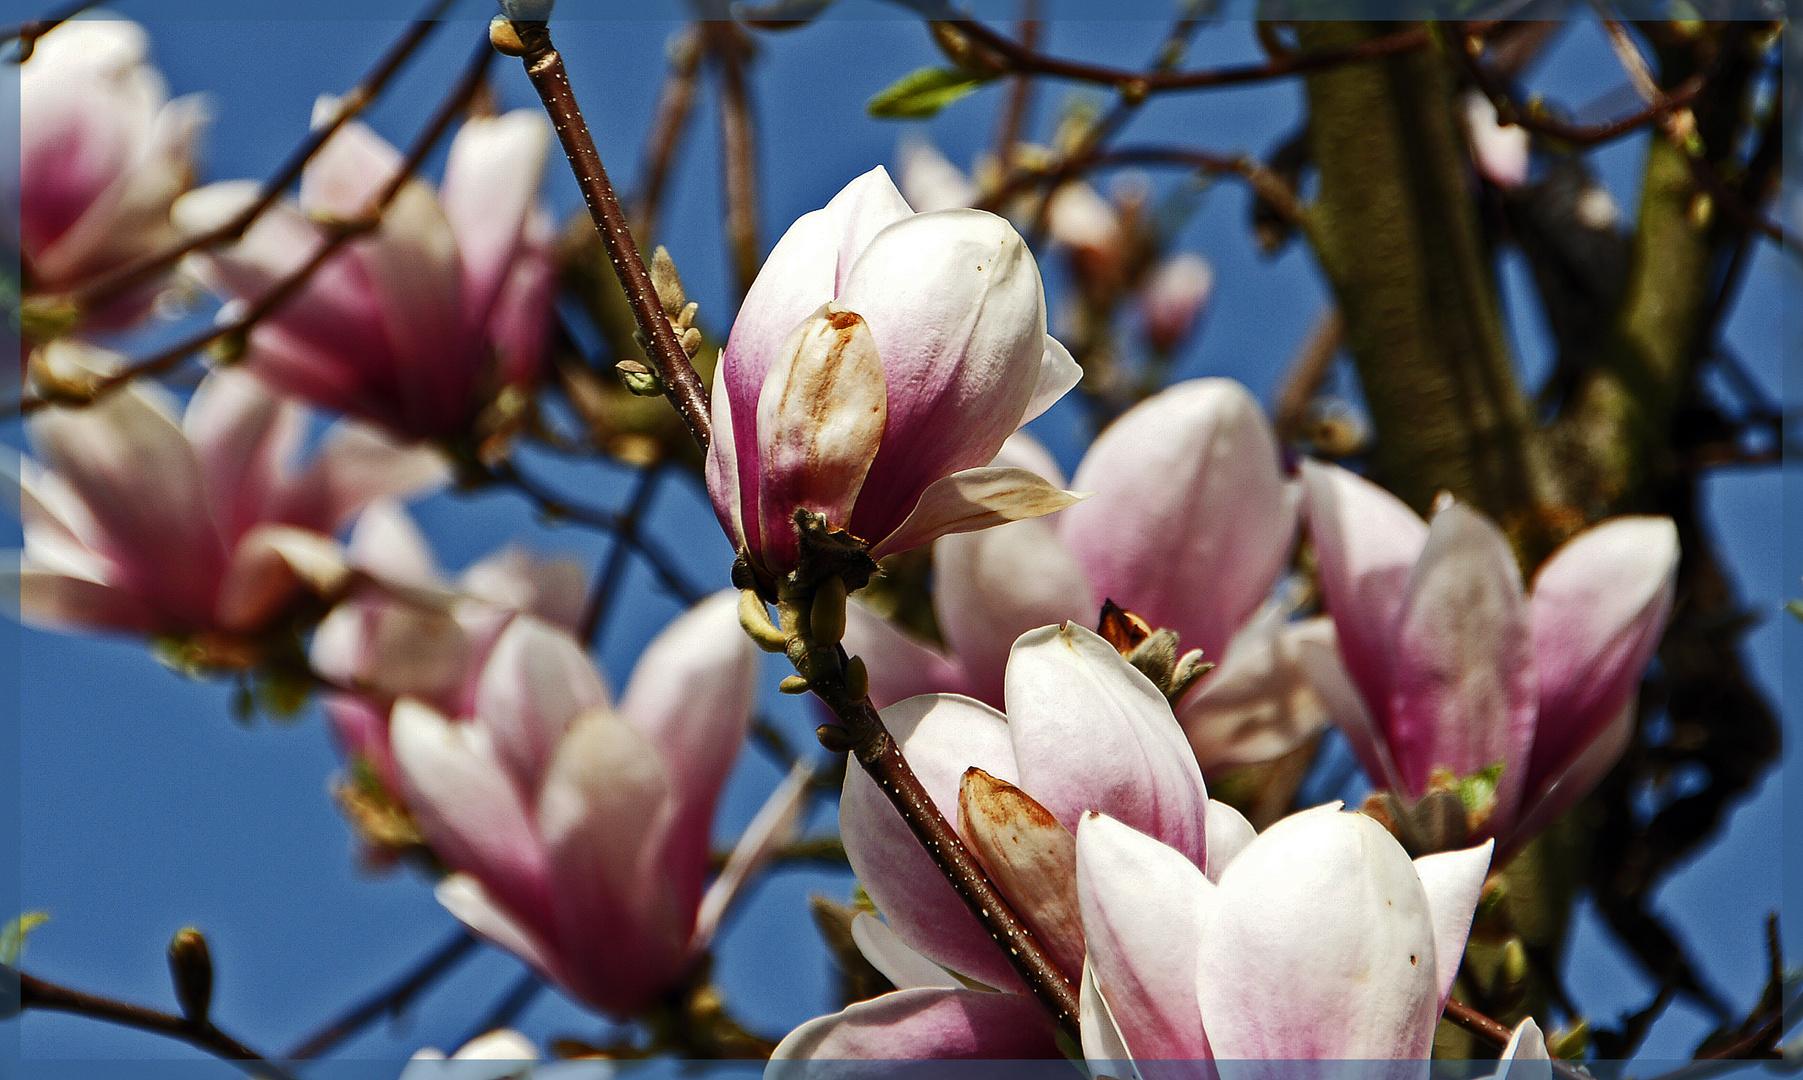 Tulpenbaum oder Magnolienbaum